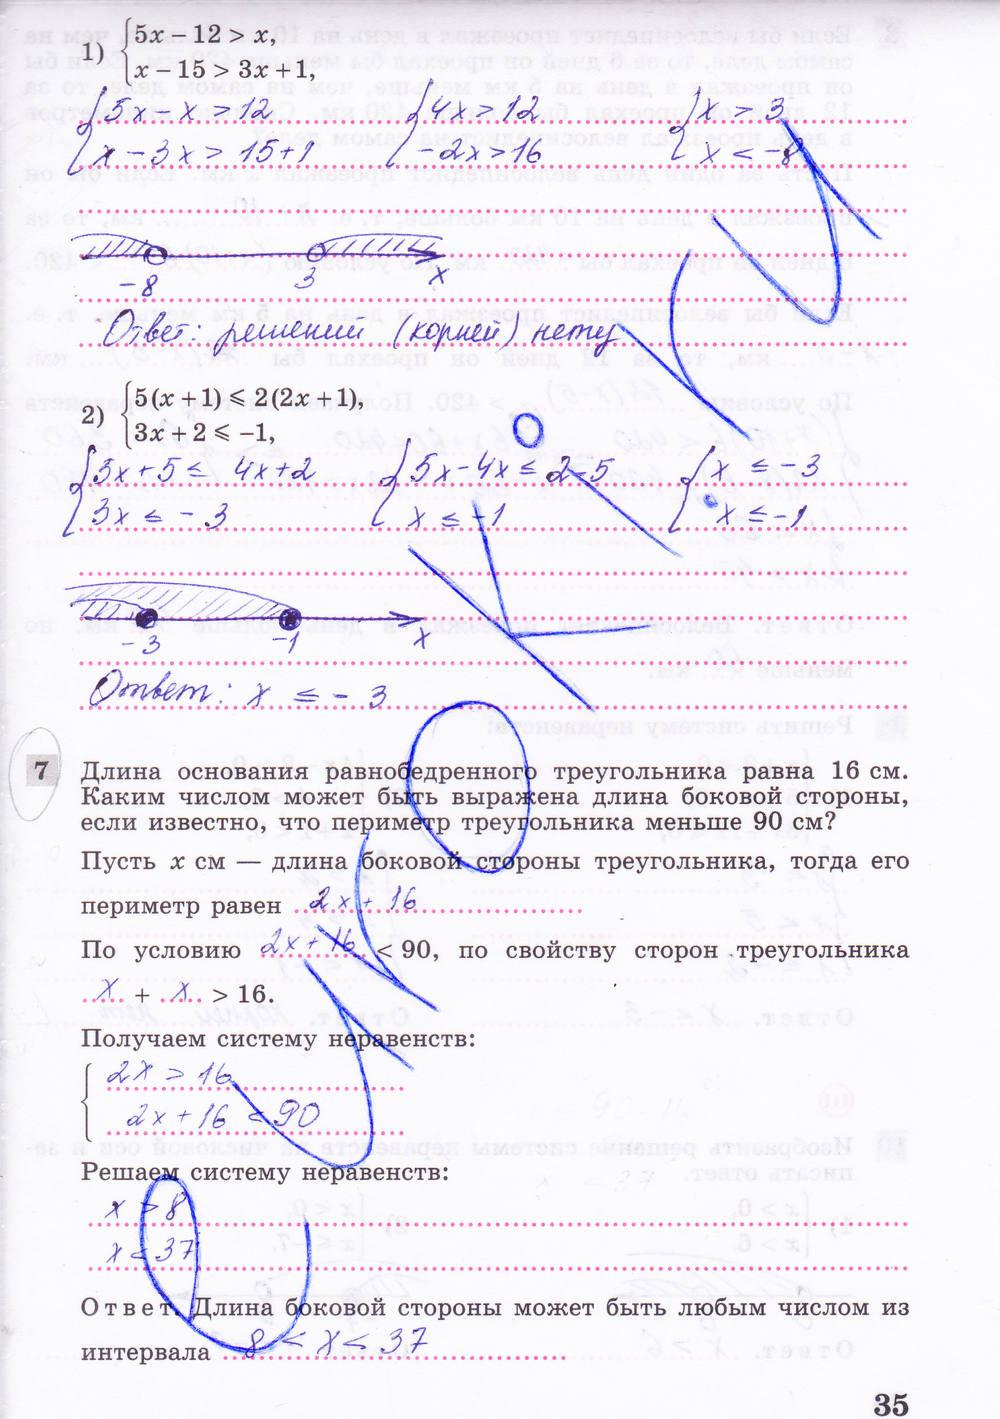 Алгебра Рабочая Тетрадь 8 Класс Гдз Колягин Ткачева